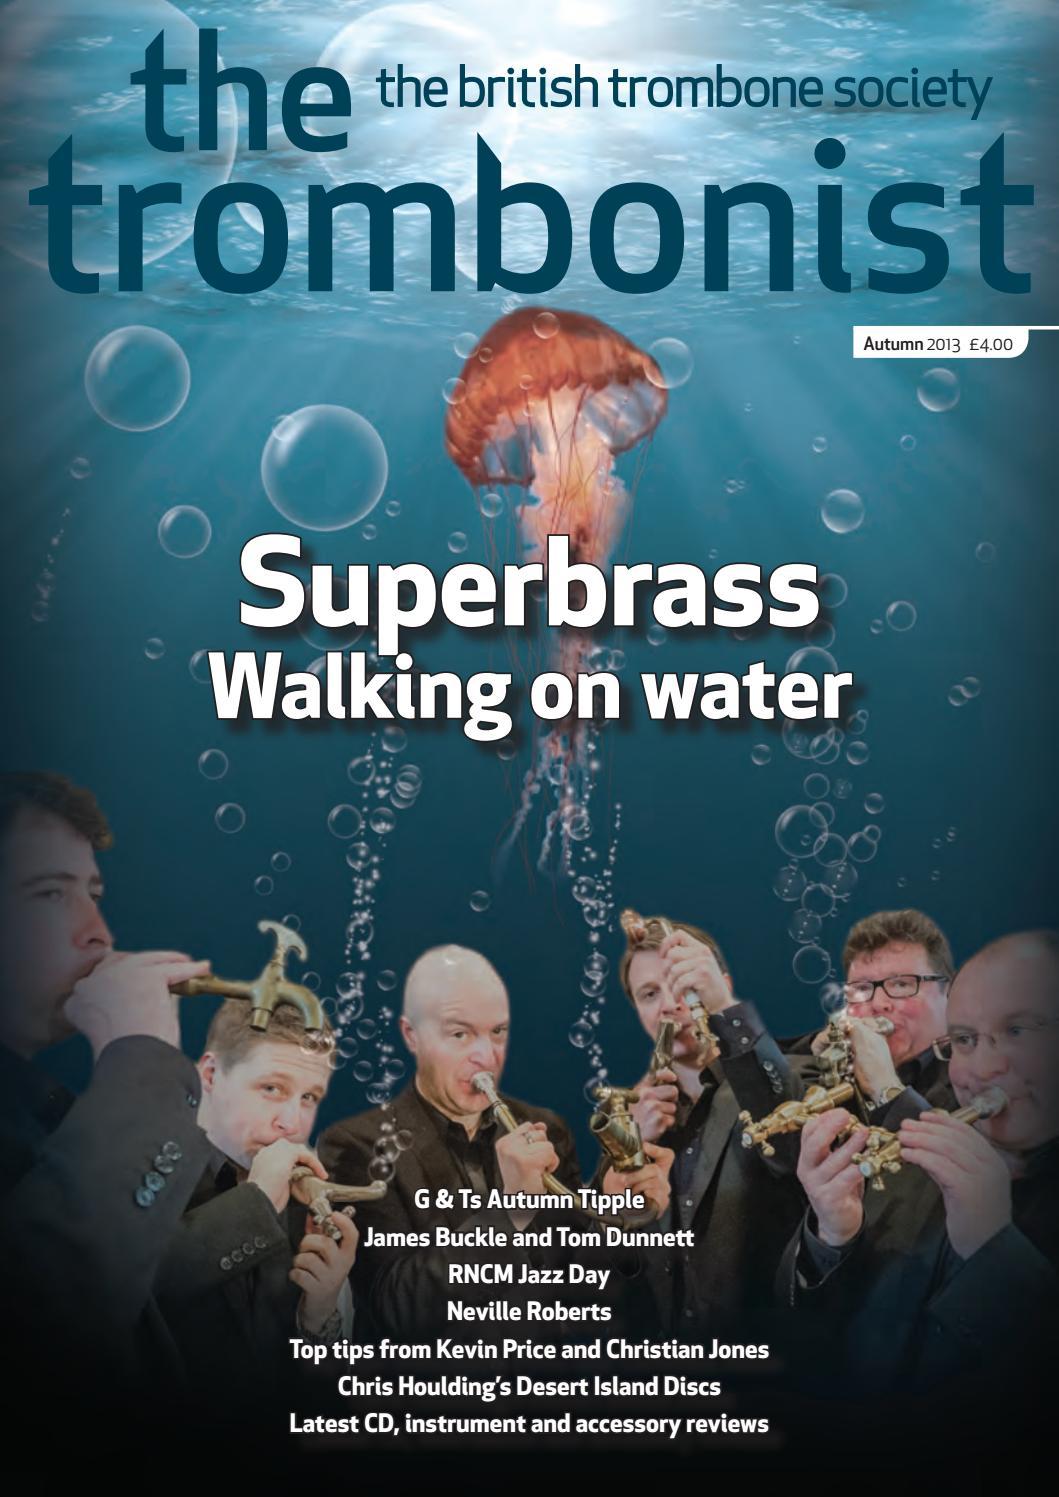 Andrea Berg Oops the trombonist - autumn 2013british trombone society - issuu